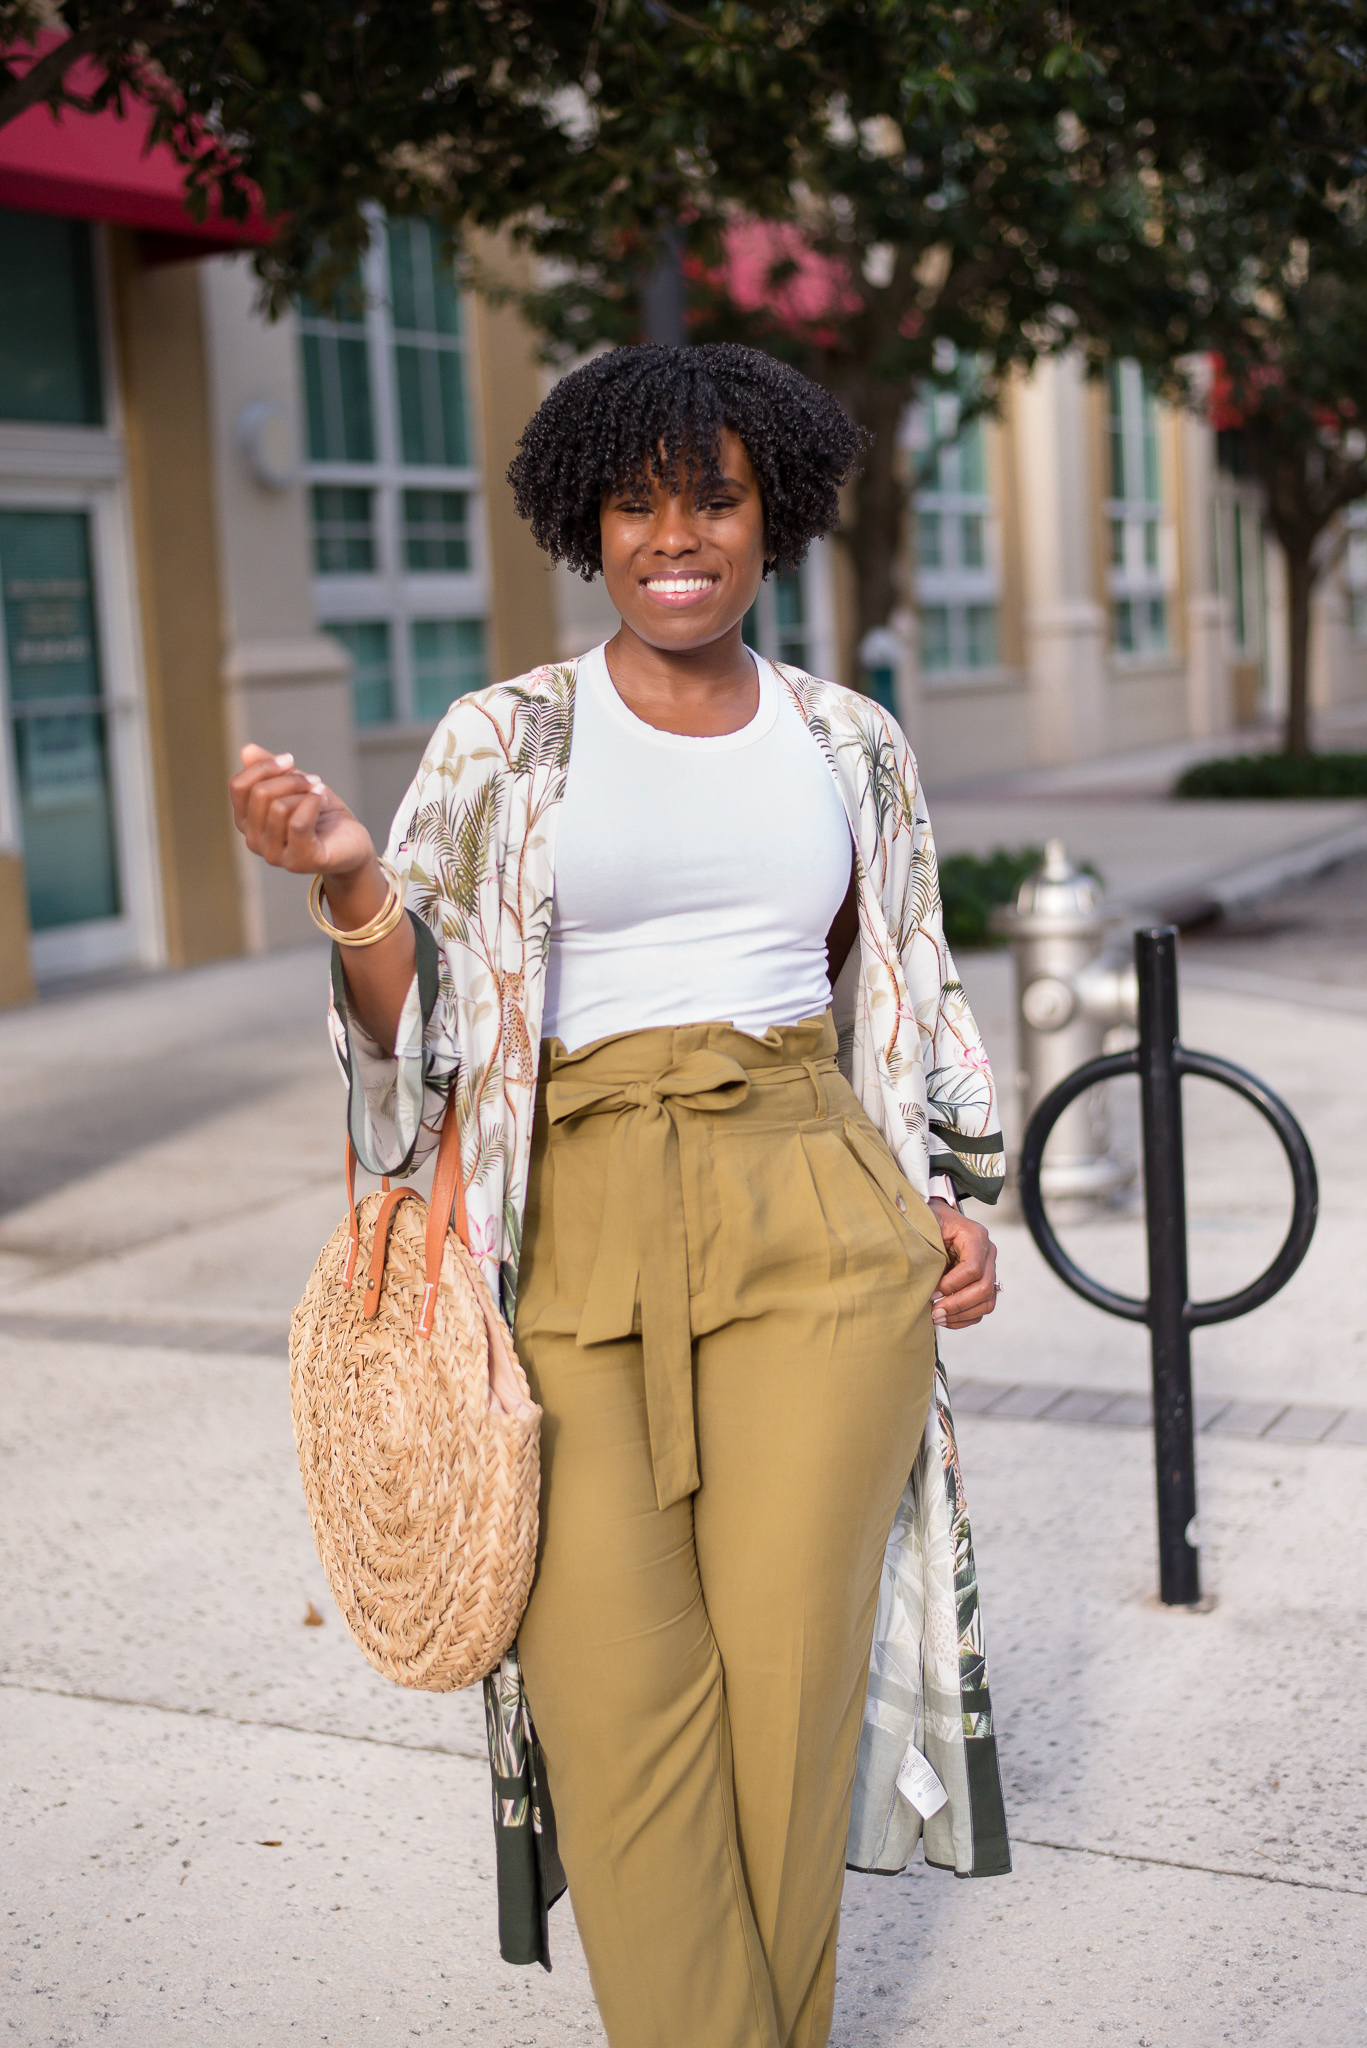 floral H&M kimono, high waist pants, linen paper bag pants, Target straw tote, how curvy girls wear high waist pants